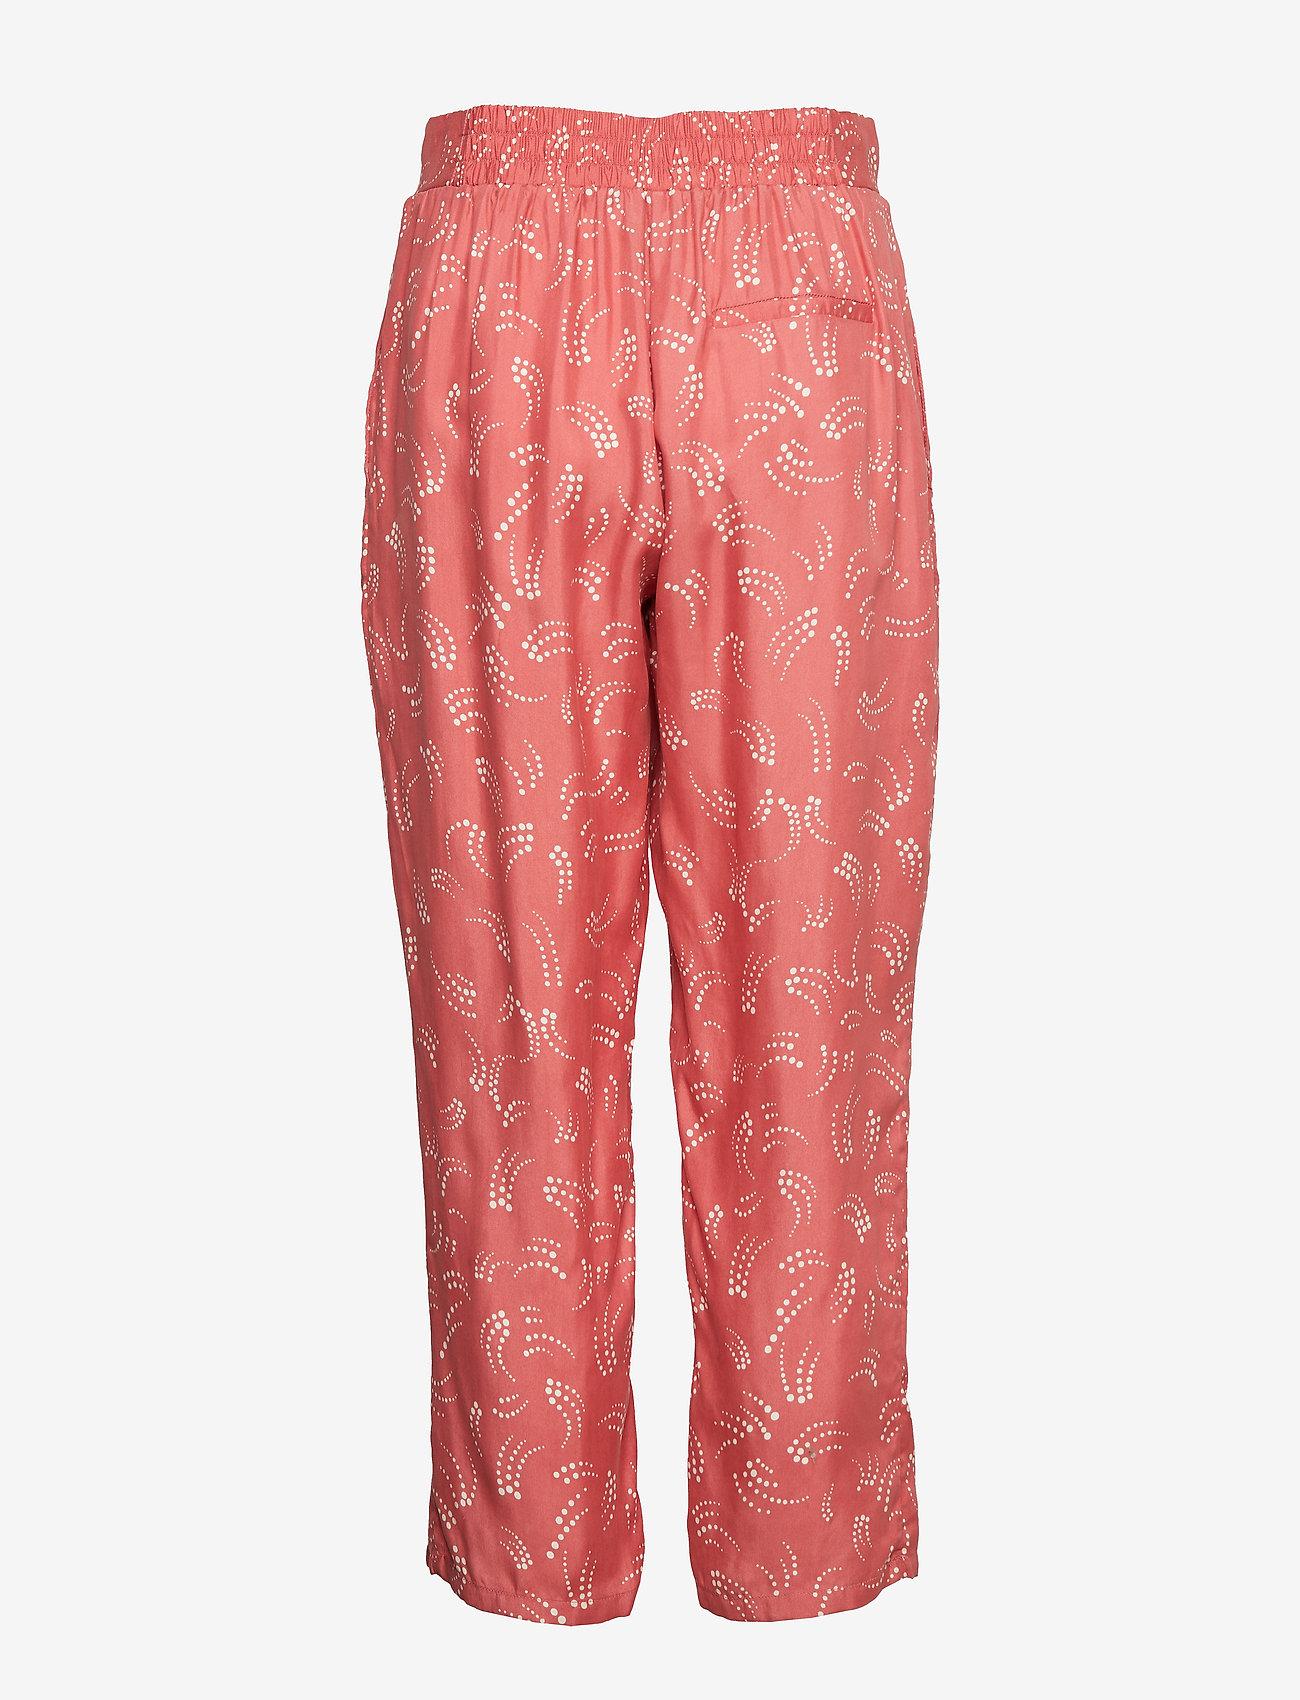 Pants In Dot Print W. Elastic Waist (Canyon Rose) (519.60 kr) - Coster Copenhagen